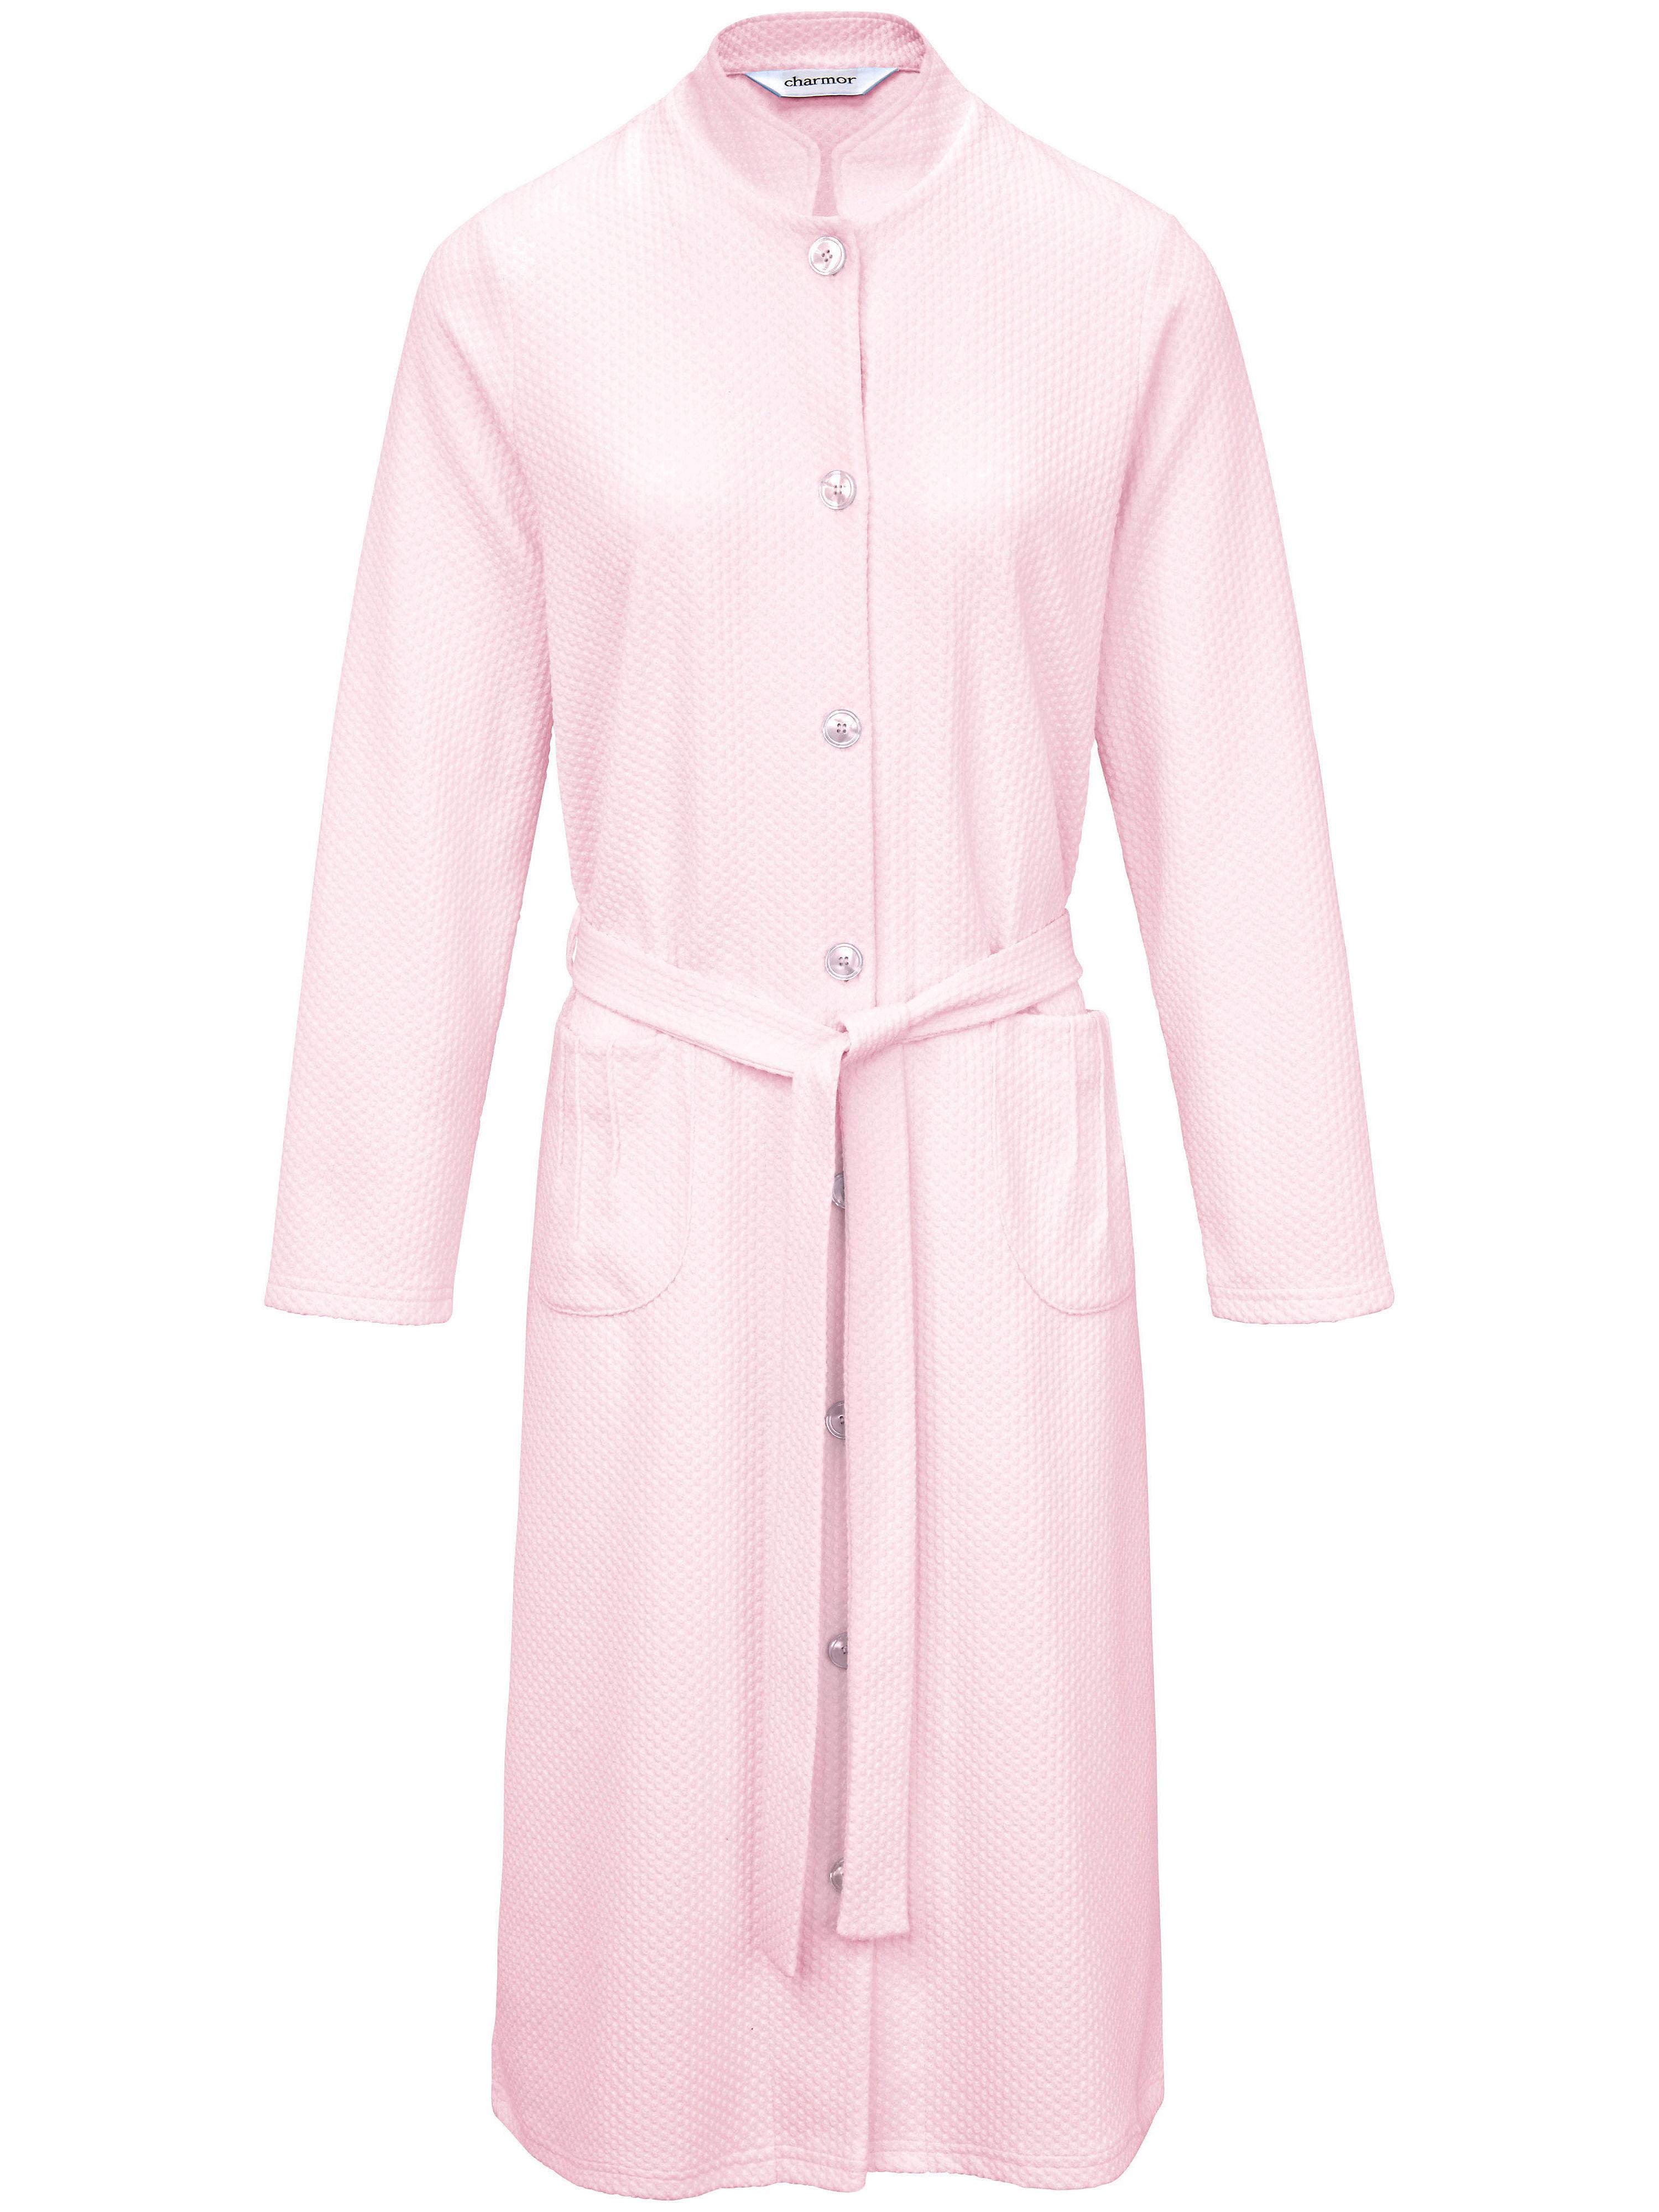 Morgenmantel Stehkragen Charmor rosé | Bekleidung > Homewear > Morgenmäntel | Jacquard | Charmor